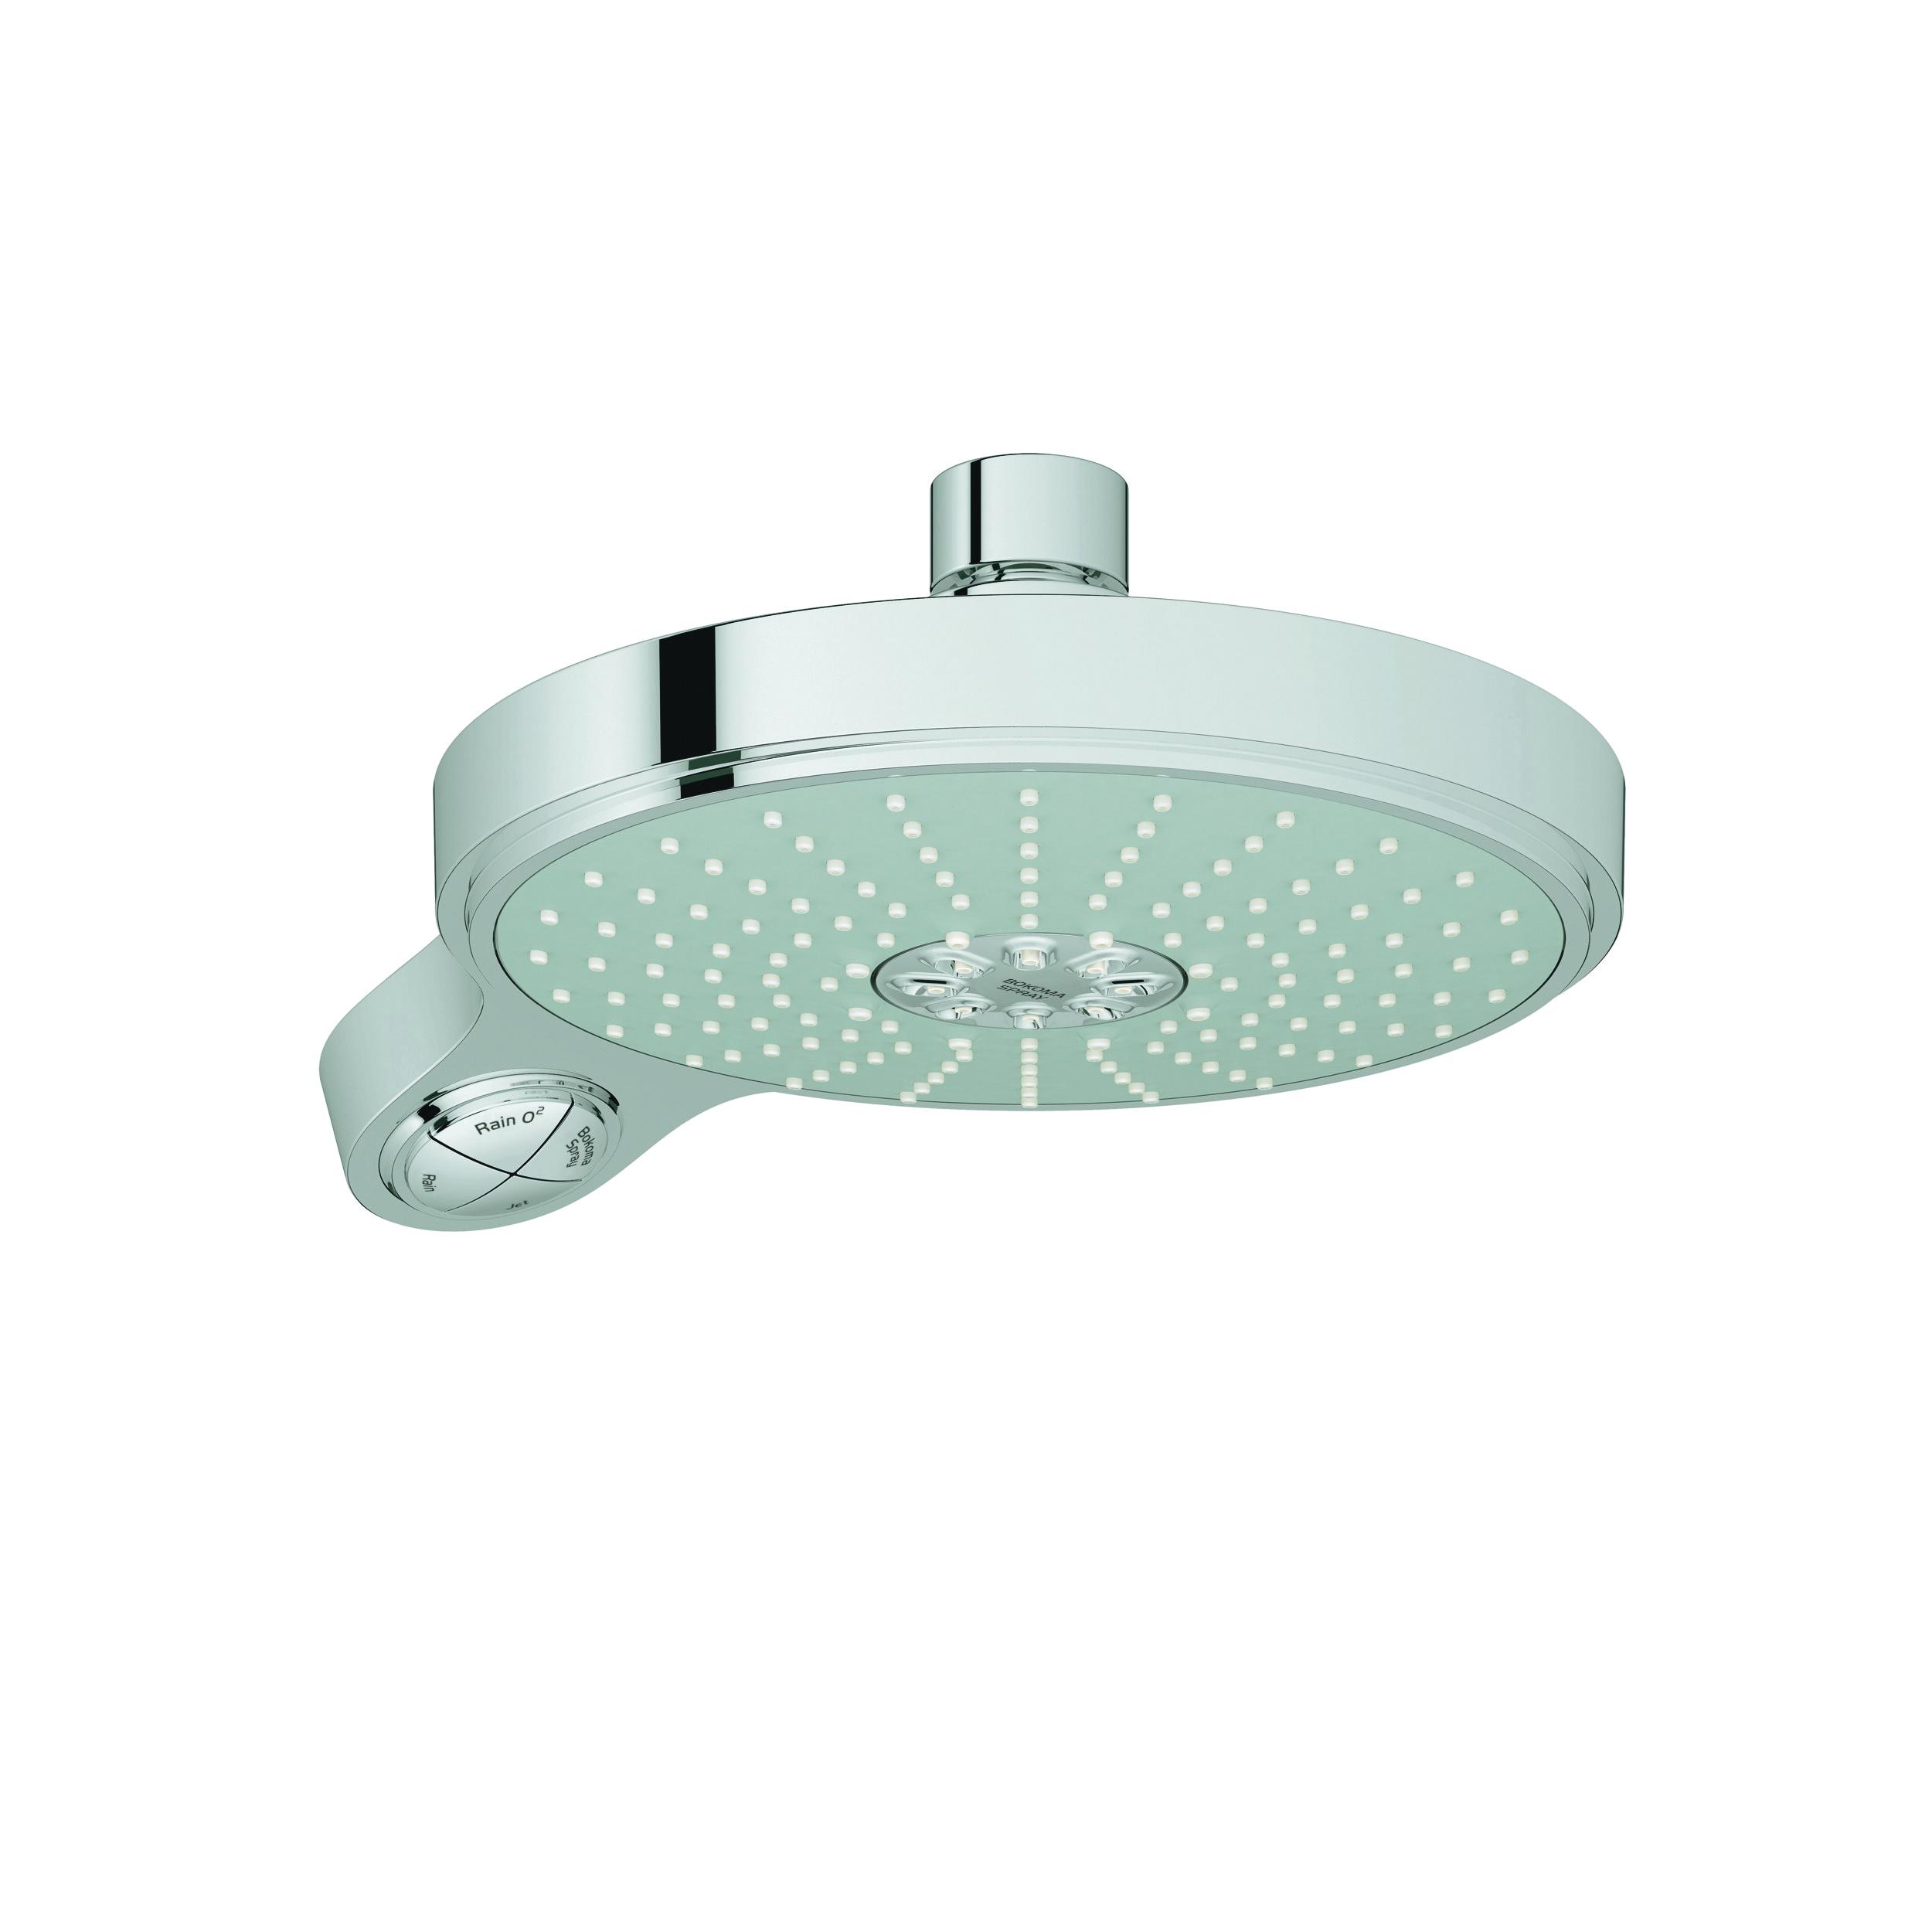 GROHE 27765000 Power&Soul® Cosmopolitan 190 Shower Head, 2.5 gpm, 4 Sprays, Wall Mount, 7-1/2 in Dia Head, Import